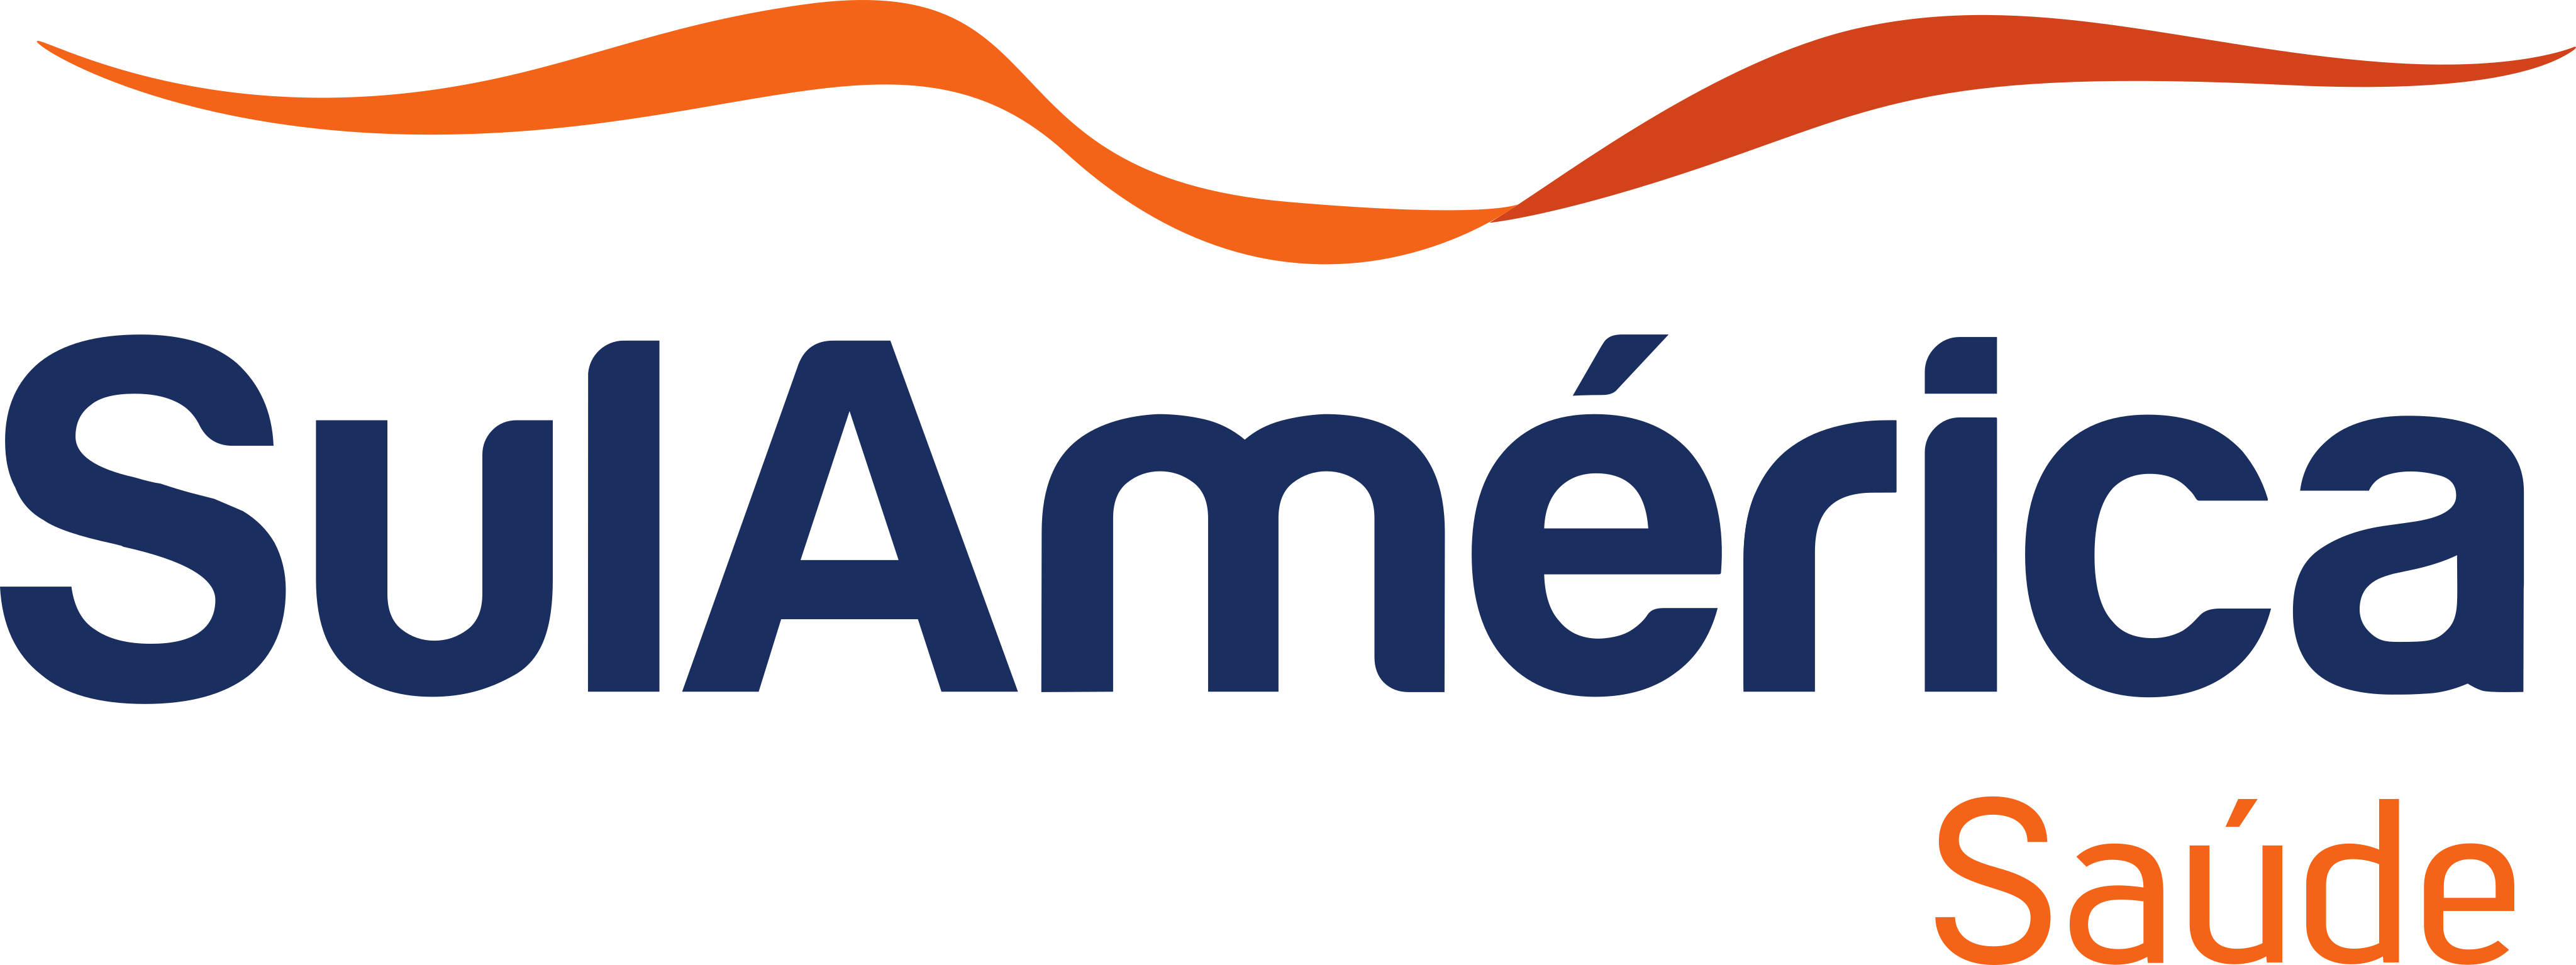 sulamerica-saude-logo